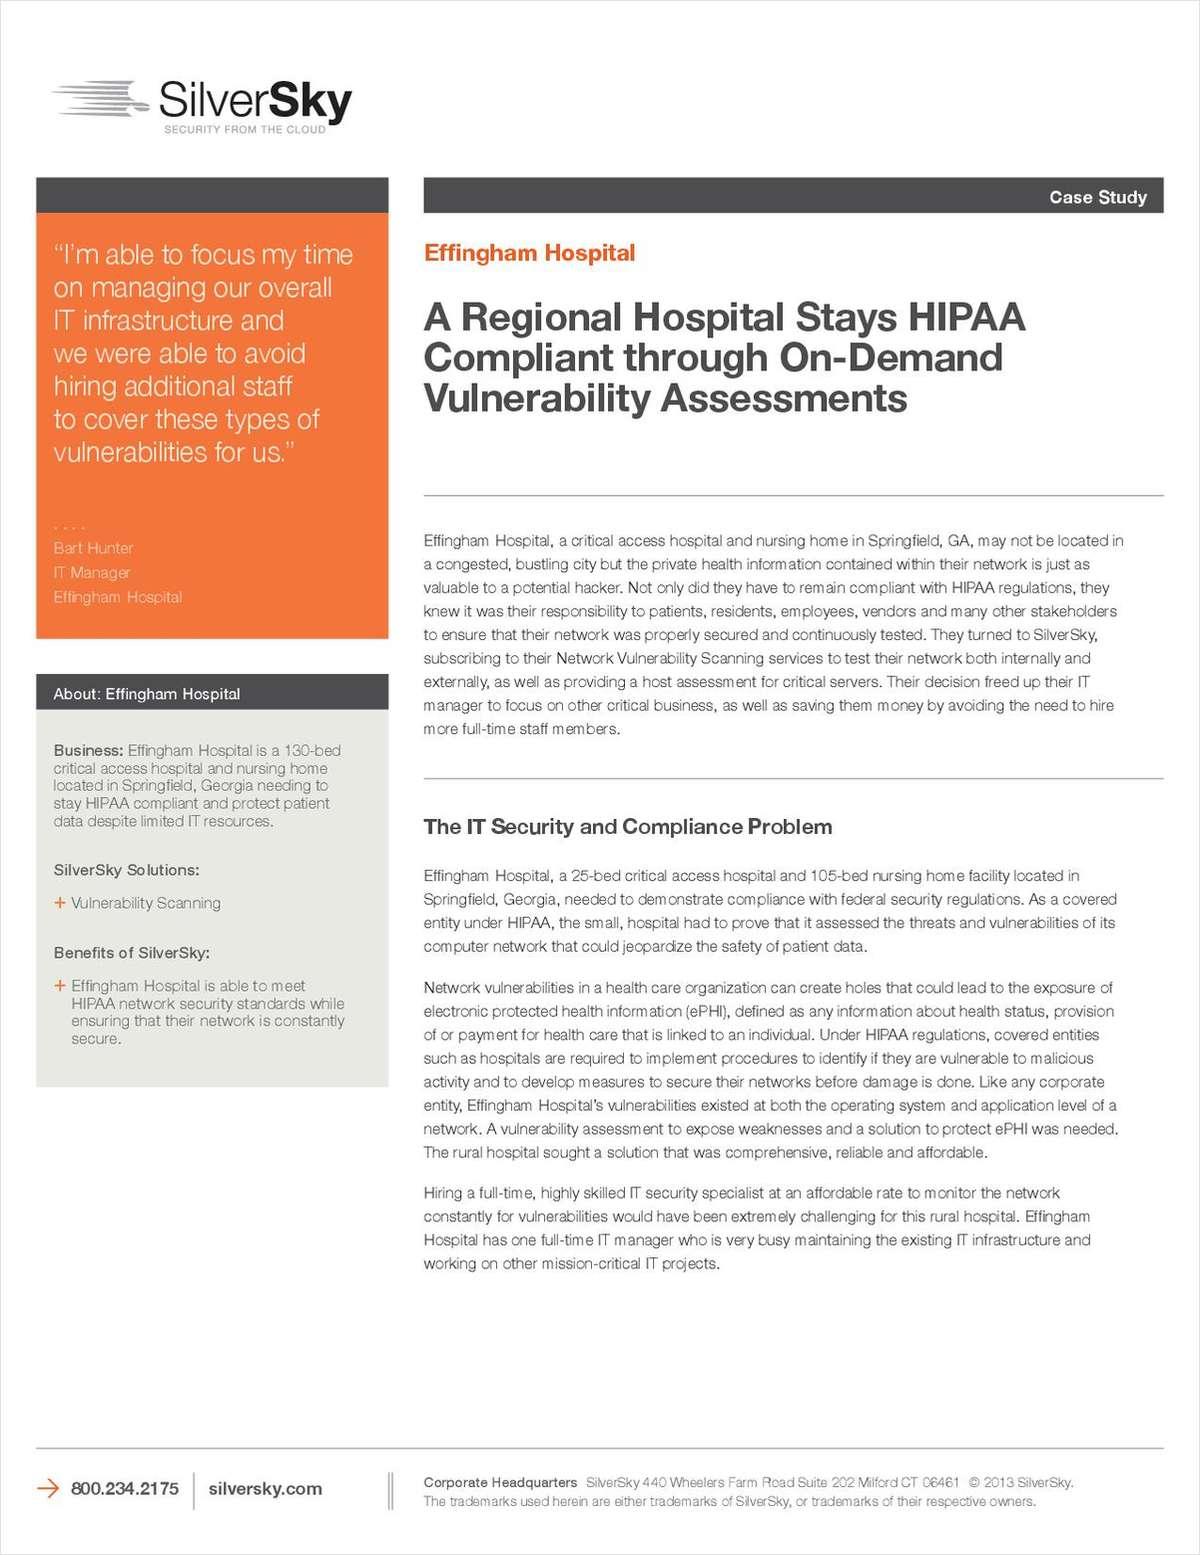 A Regional Hospital Stays HIPAA Compliant through On-Demand Vulnerability Assessments